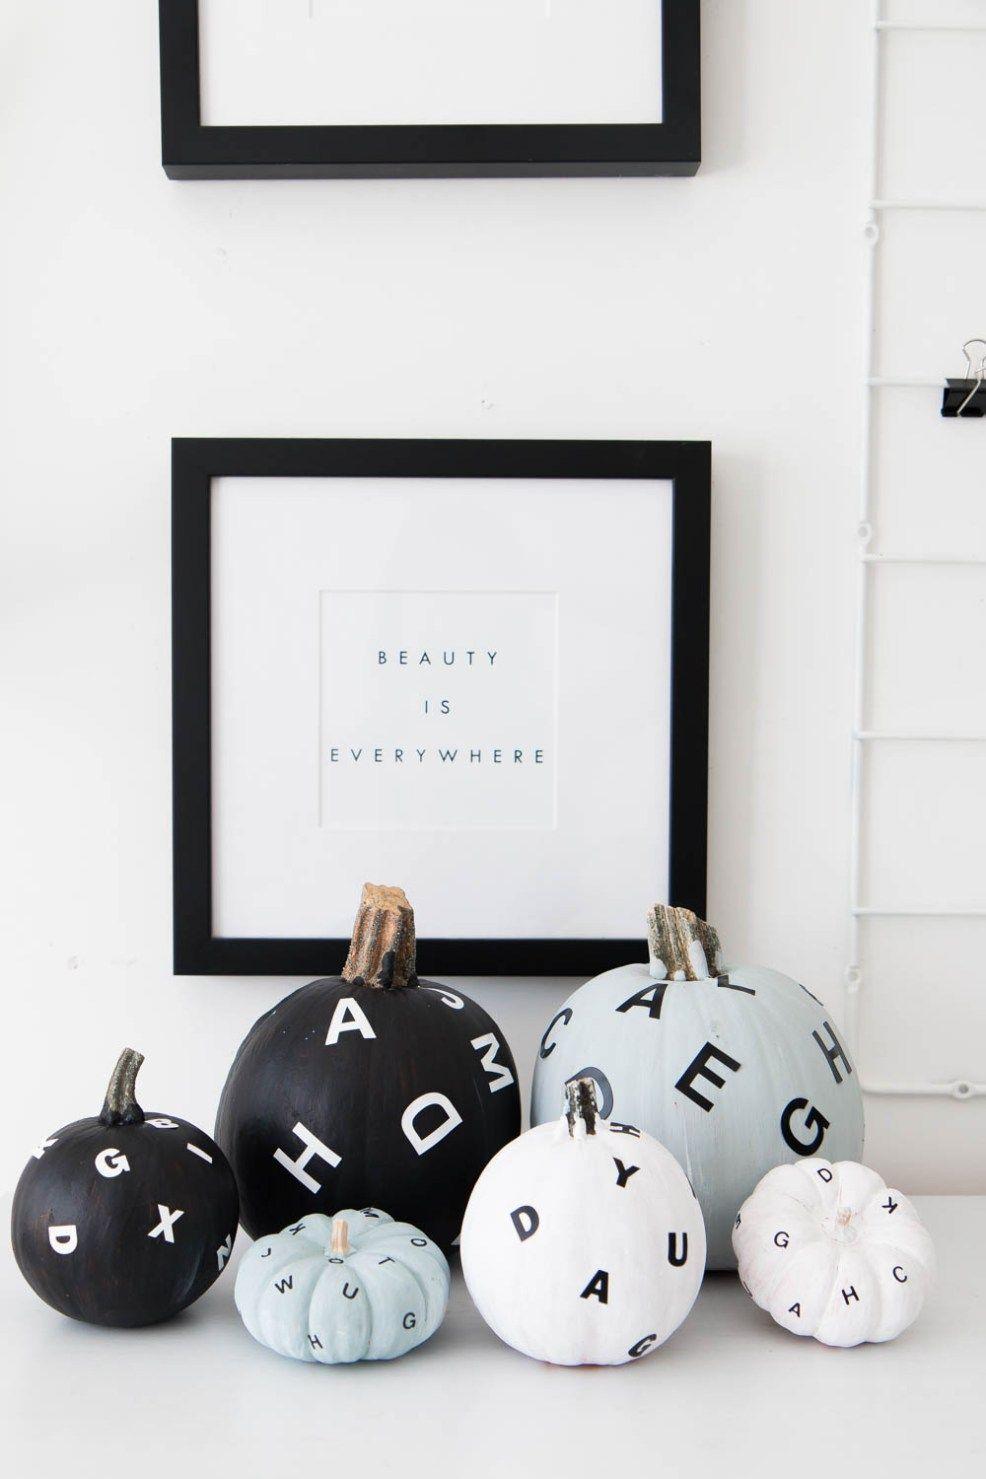 Diy Flying Letter Painted Pumpkins Mit Bildern Kurbisse Anmalen Kurbis Dekorieren Herbst Dekor